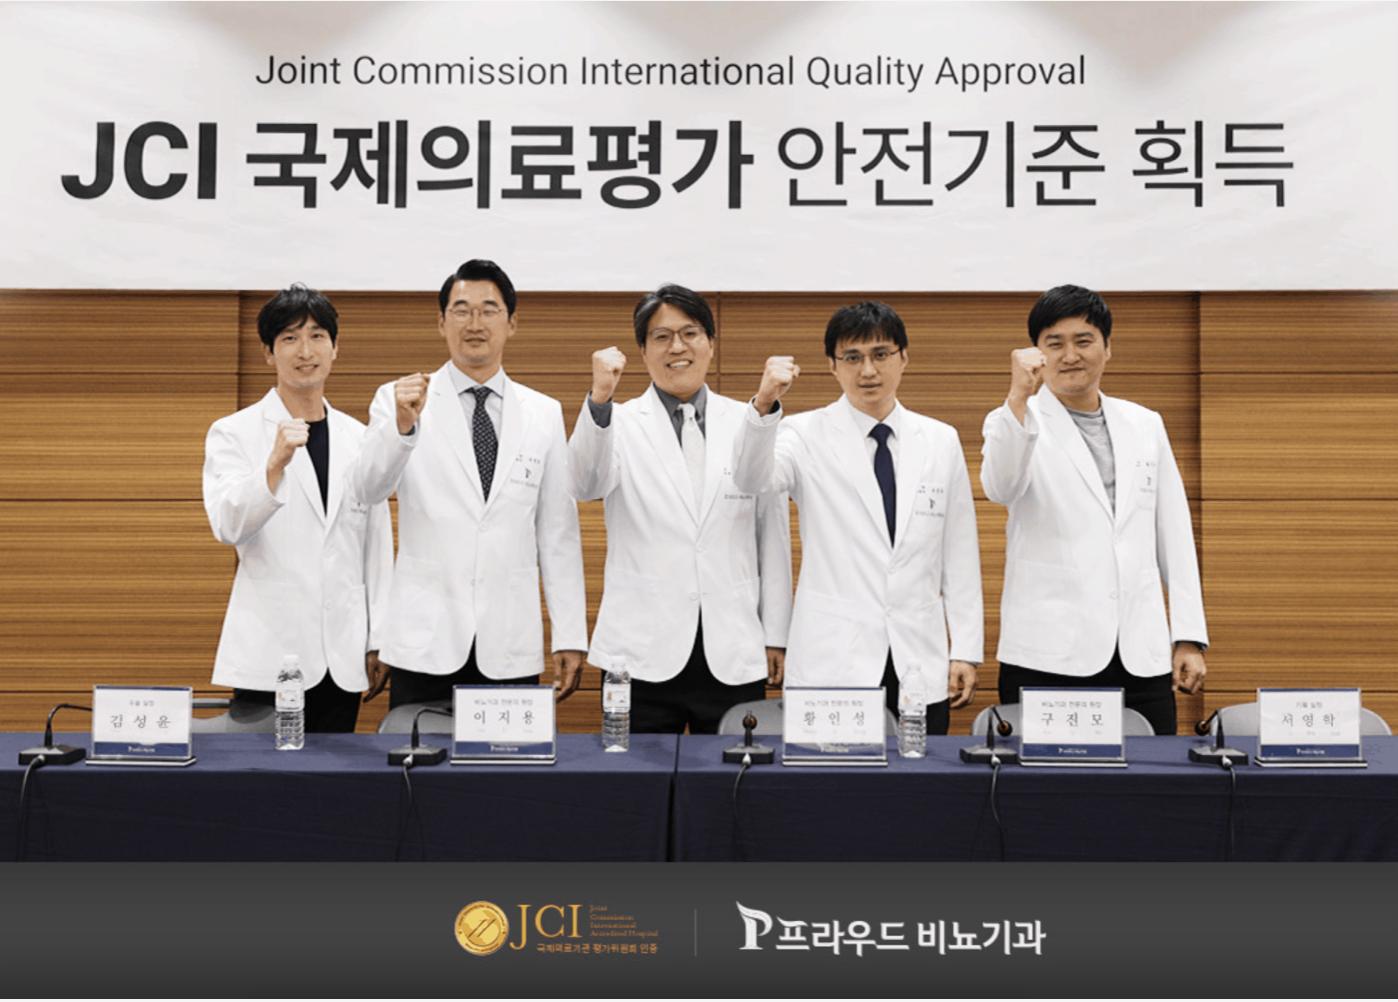 jci accreditation for proud urology clinic